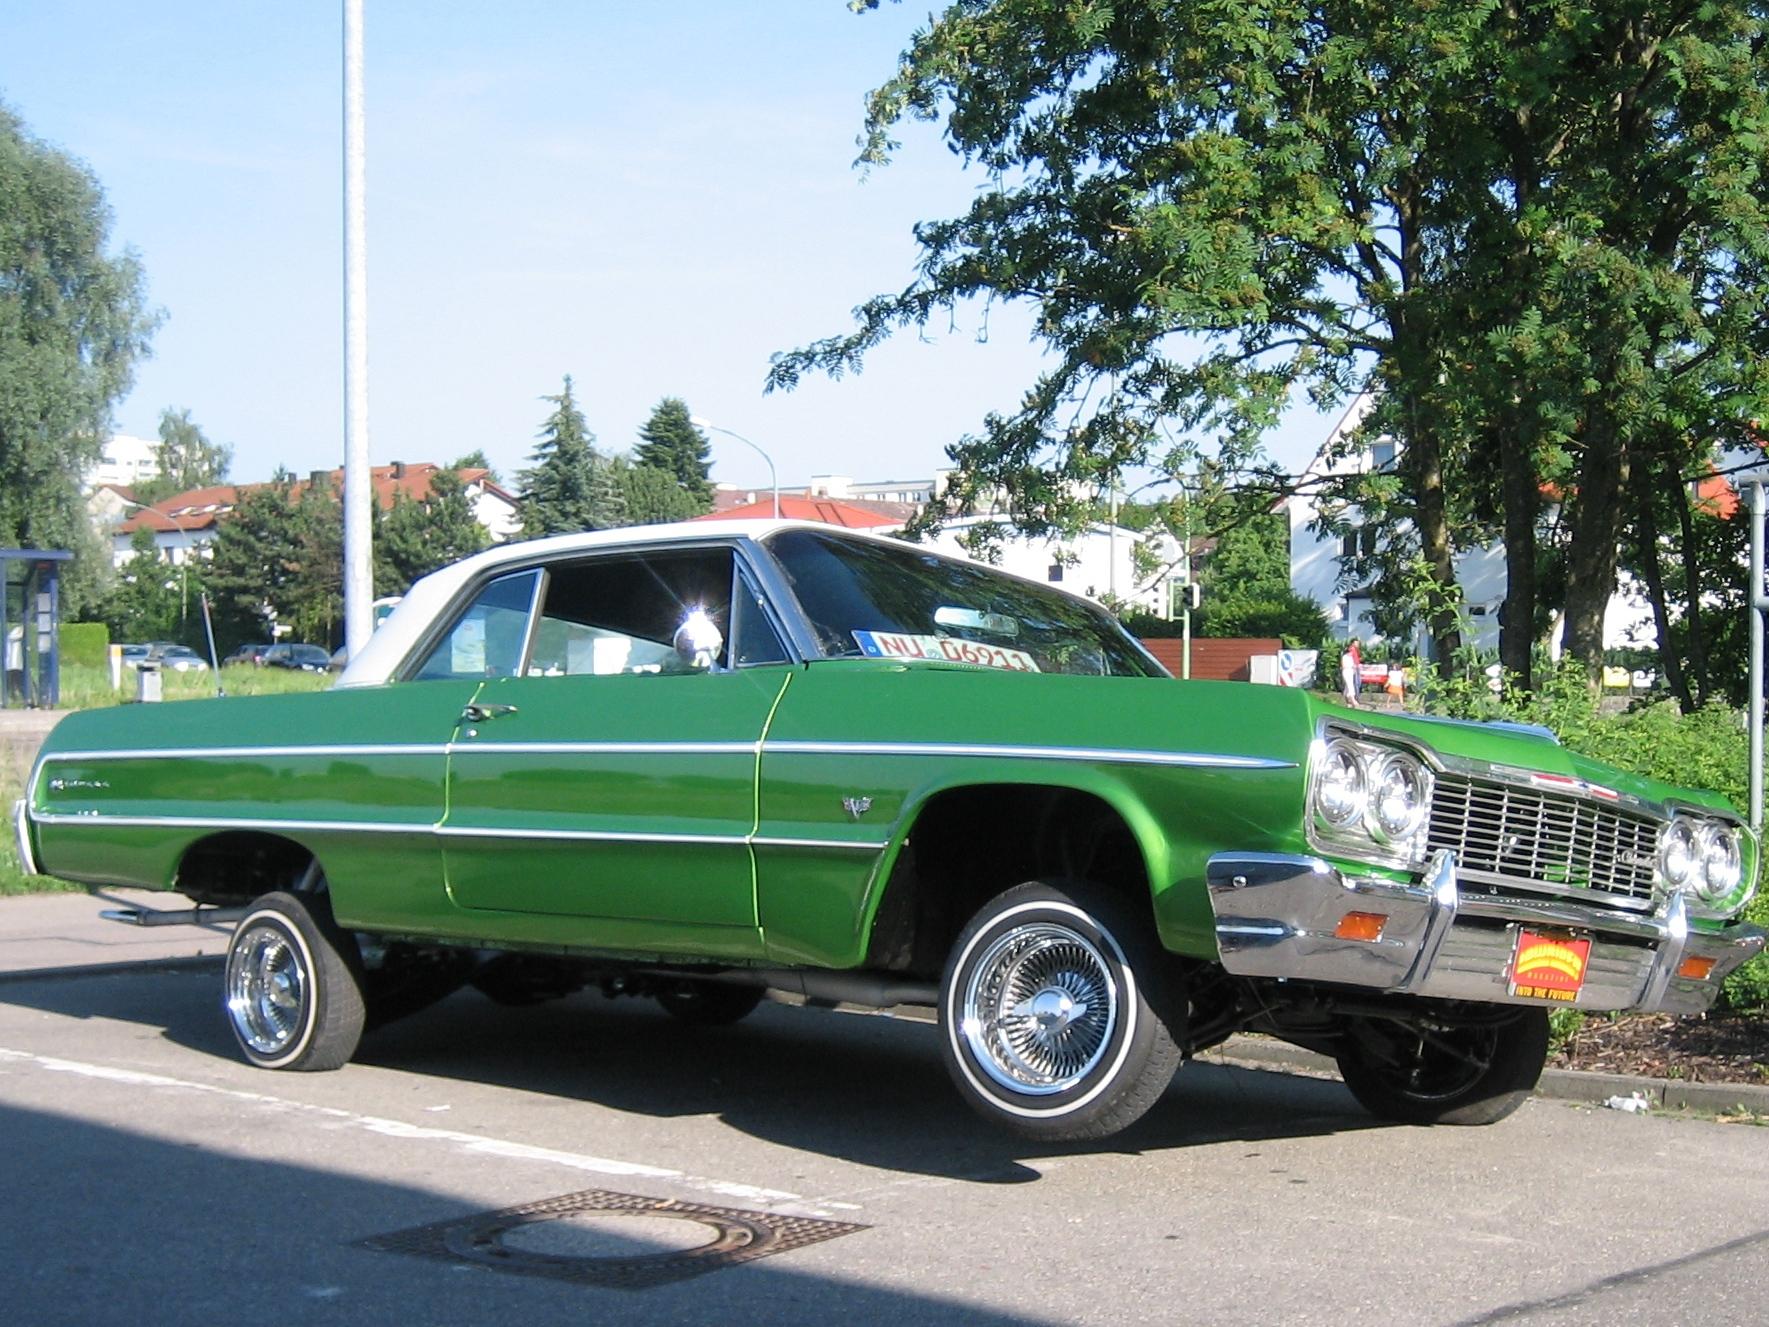 [Pedido] Mod carro/Impala Impala-1964-verde